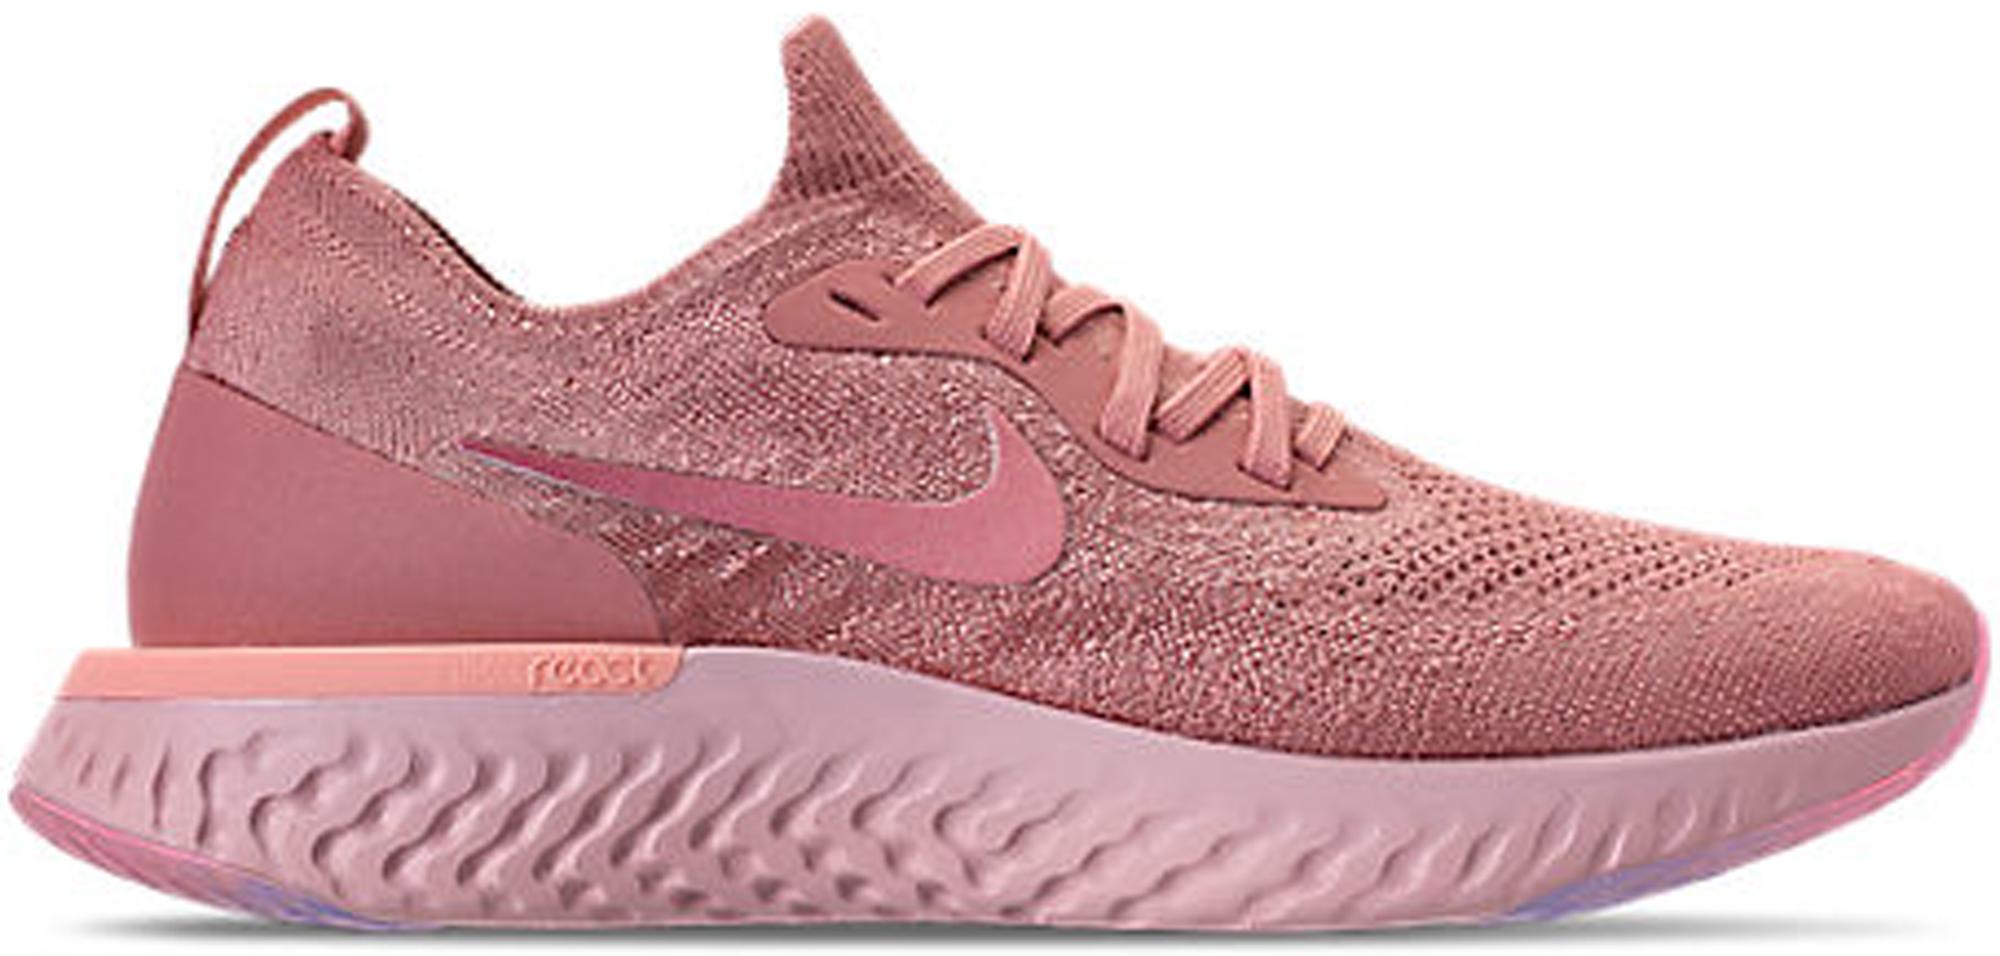 Nike Epic React Flyknit Pink Tint (W